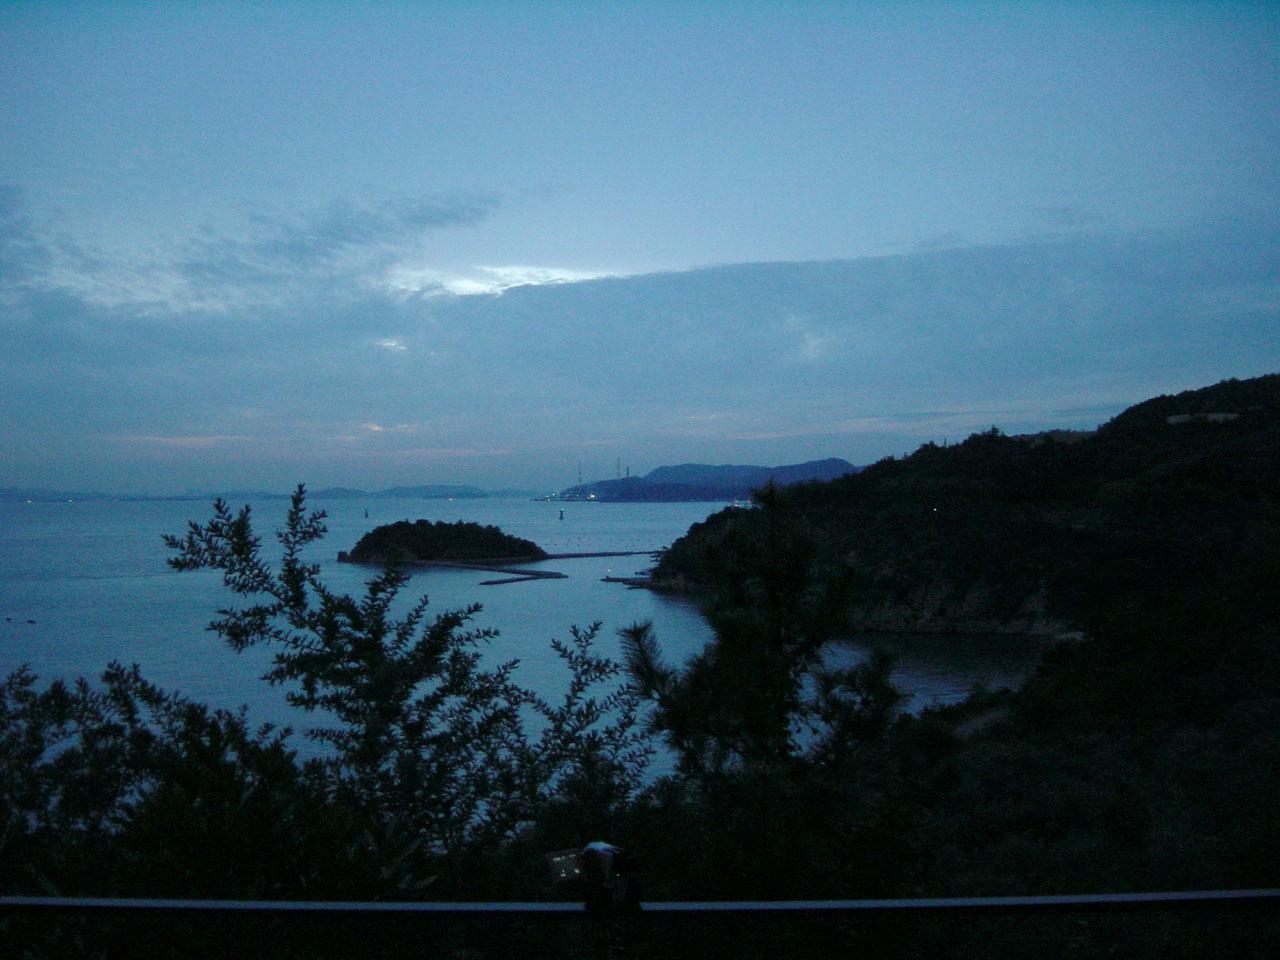 naoshima-mer-31102002